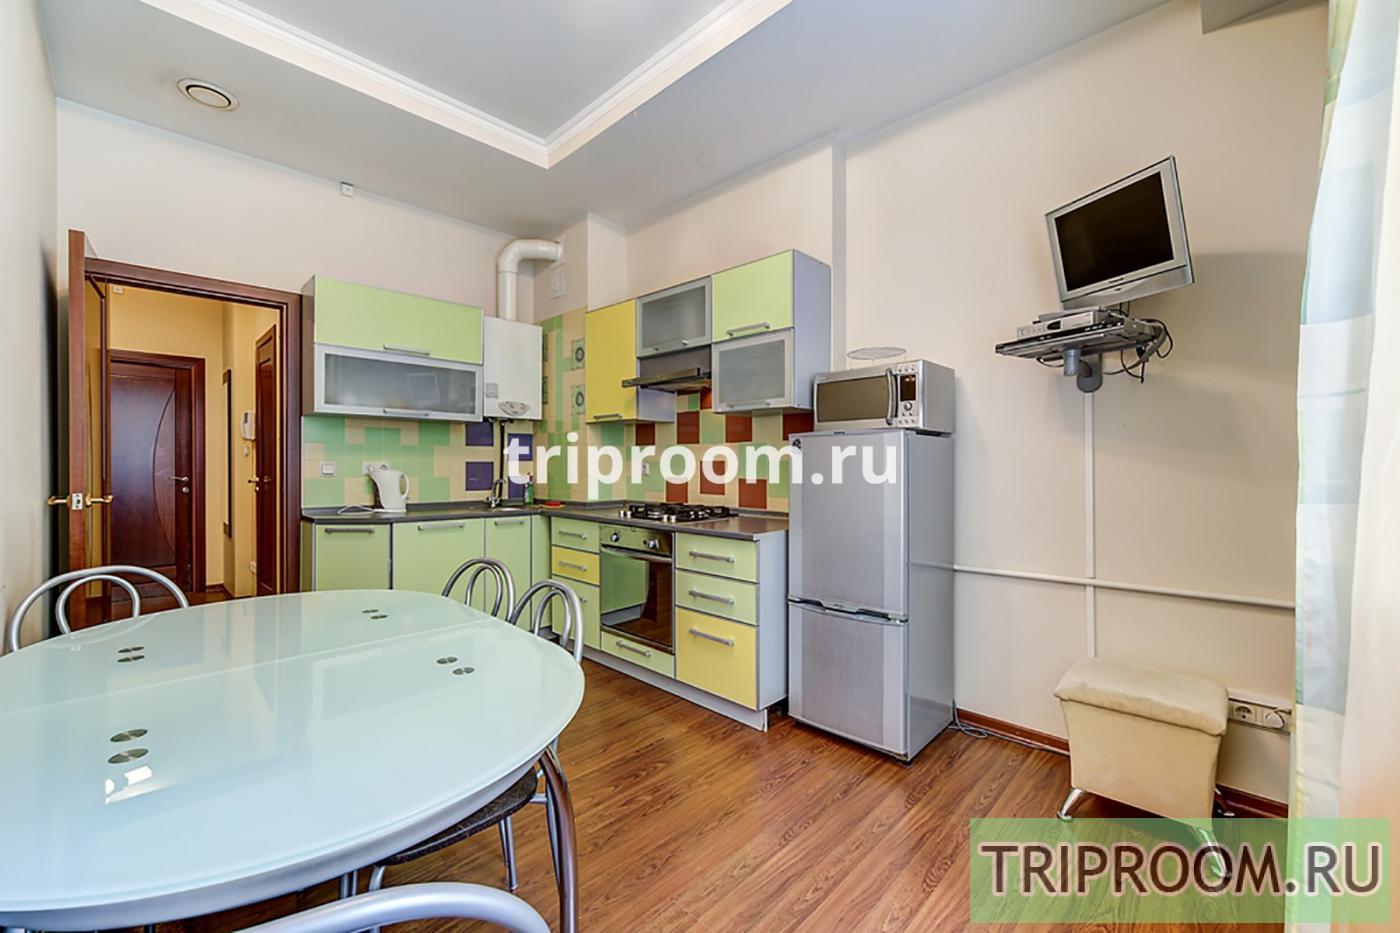 1-комнатная квартира посуточно (вариант № 15527), ул. Канала Грибоедова набережная, фото № 3